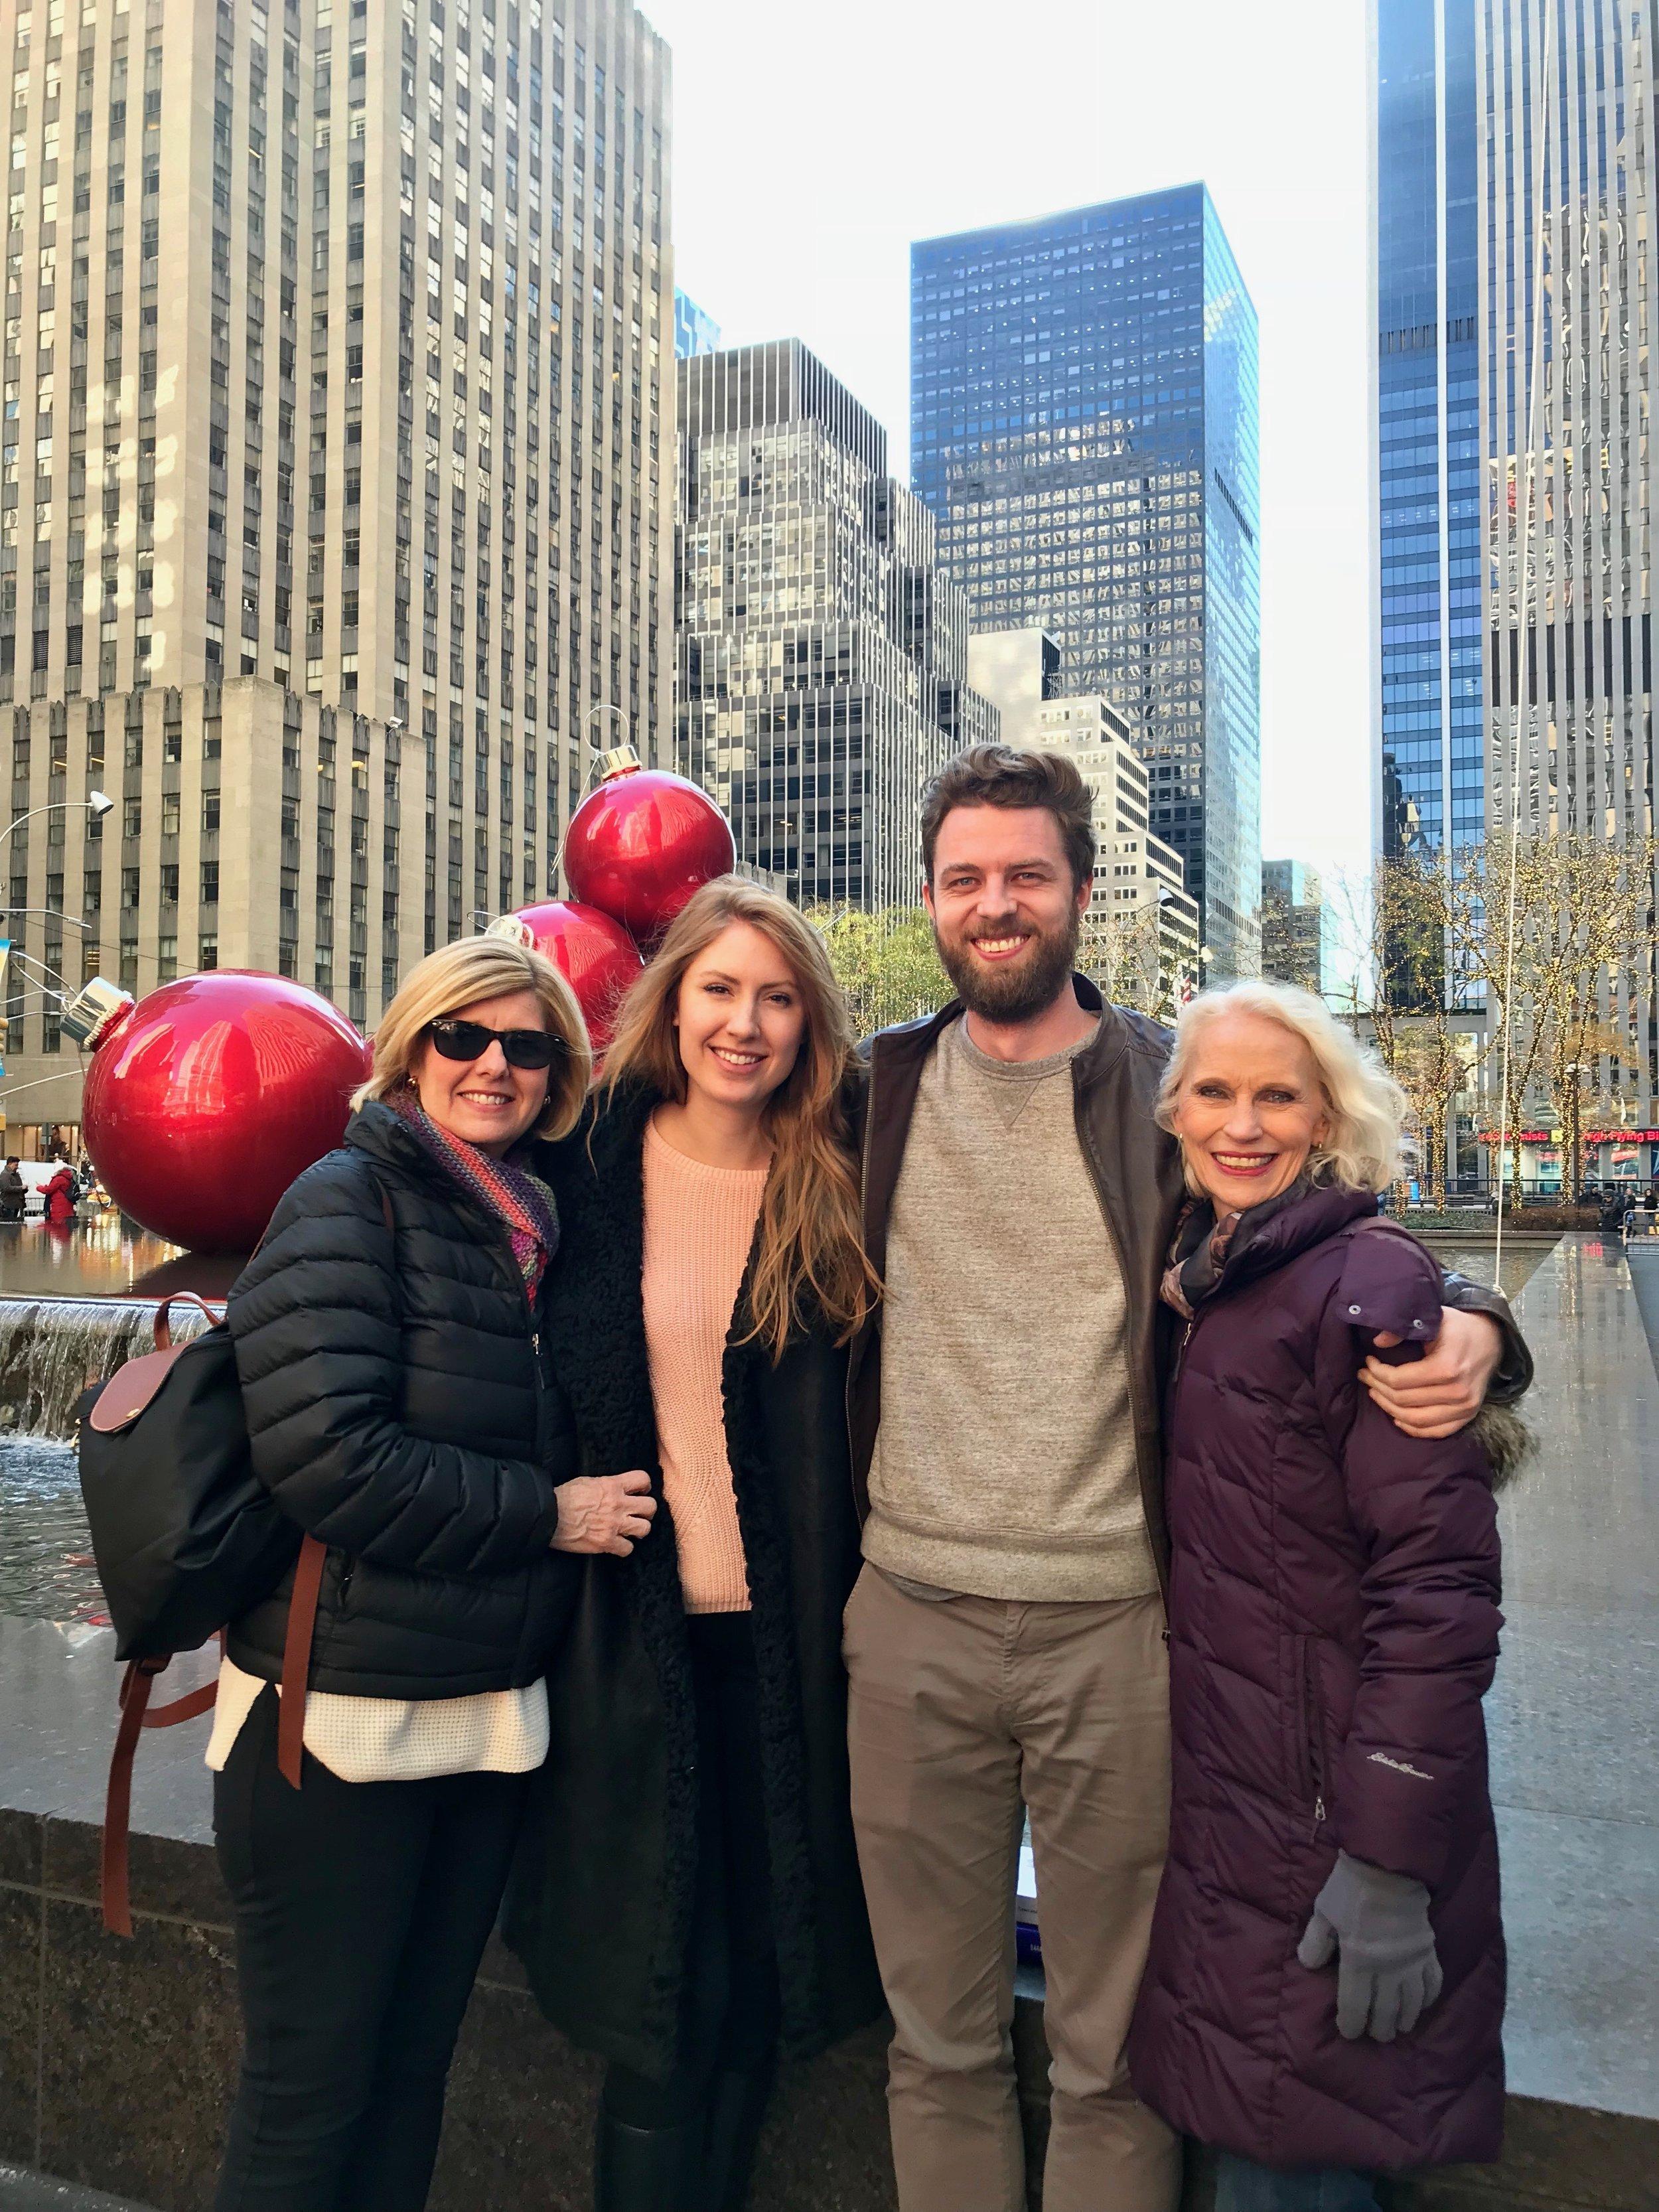 4 happy parade goers at Rockefeller Center!